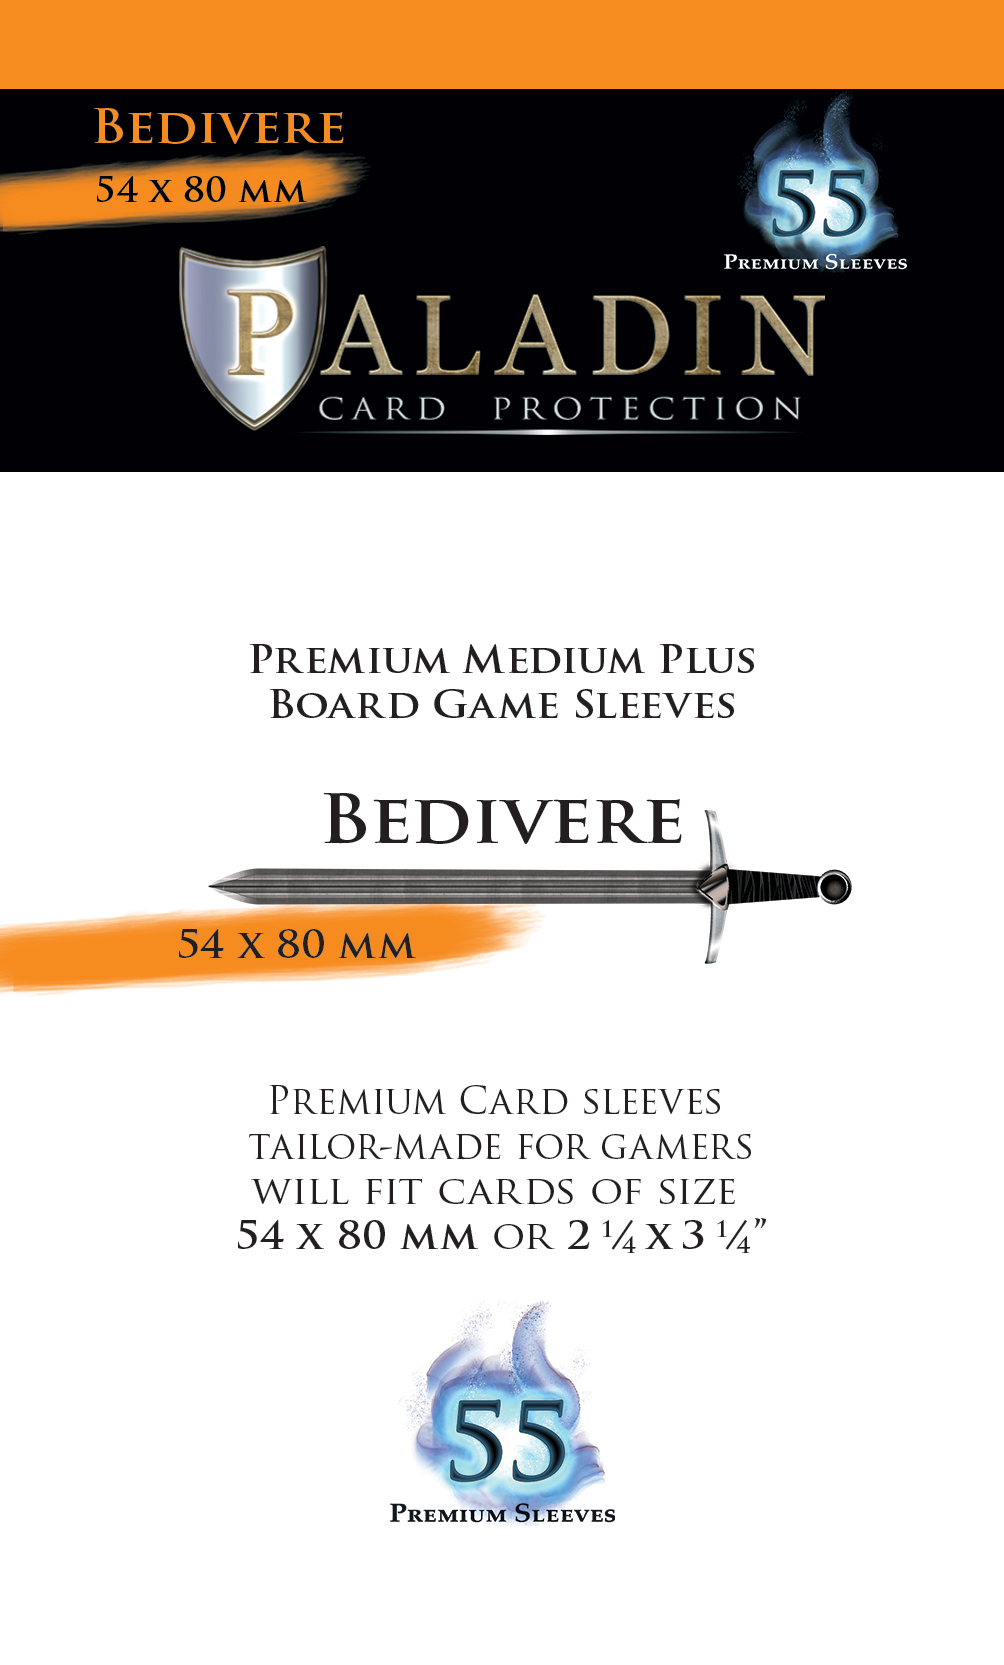 Paladin-Bedivere «Medium Plus Board Game» 54mm X 80mm / 55 Sleeves